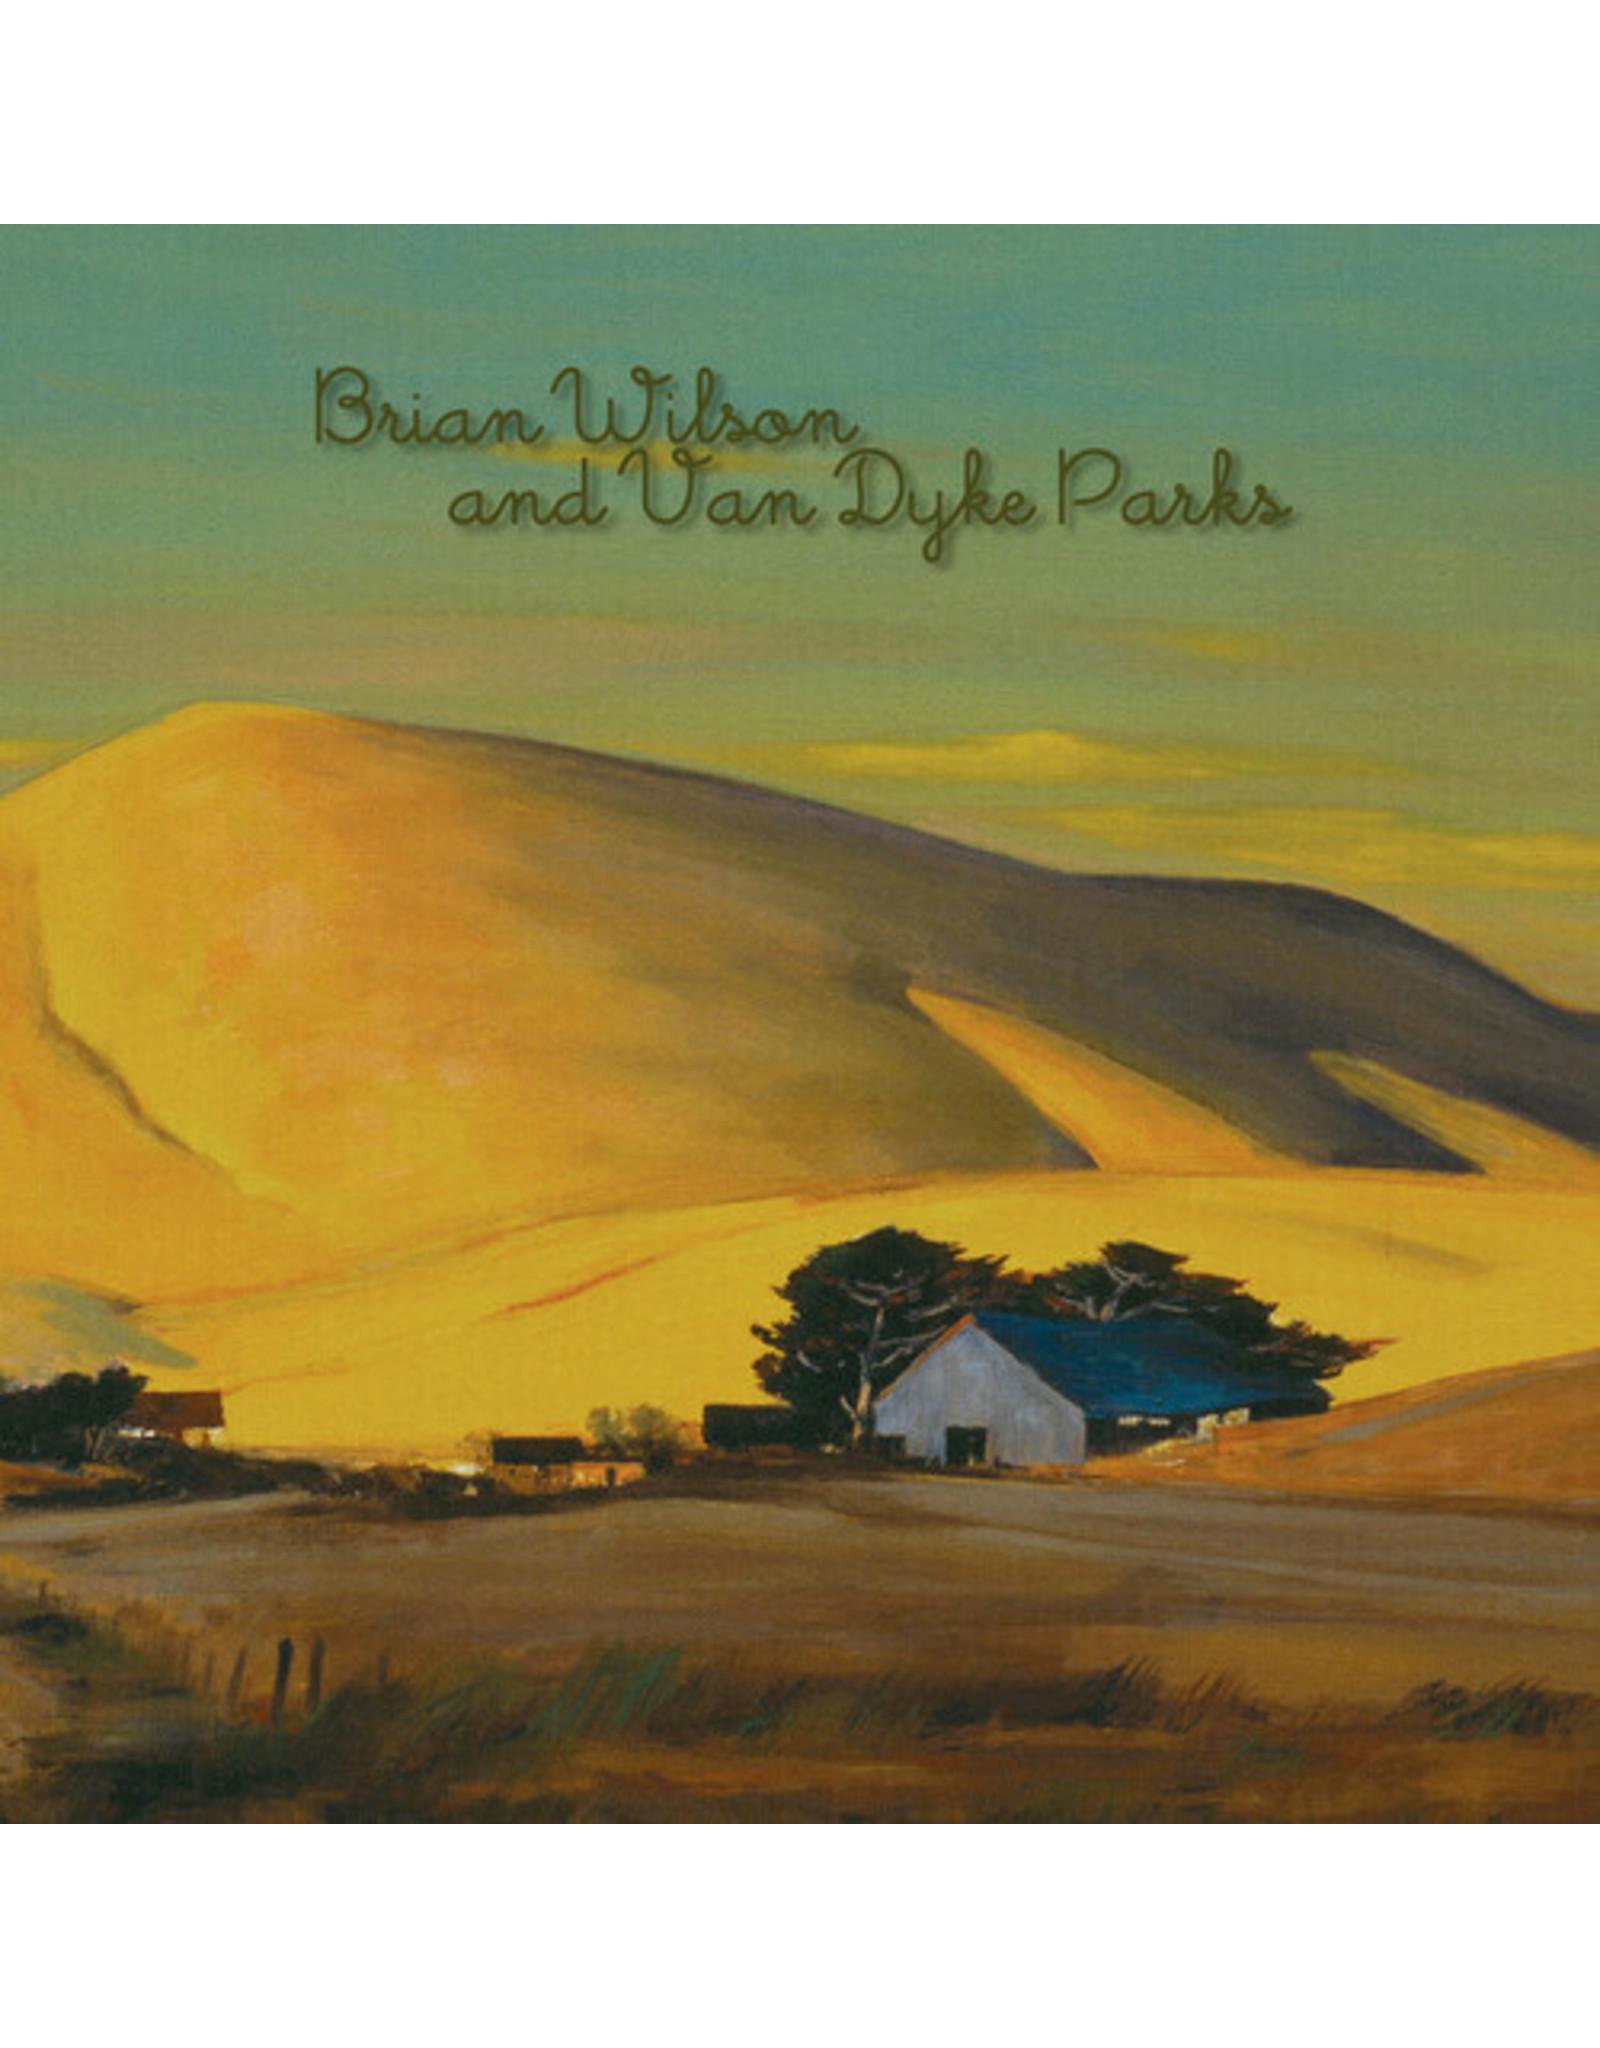 New Vinyl Brian Wilson & Van Dyke Parks - Orange Crate Art 2LP